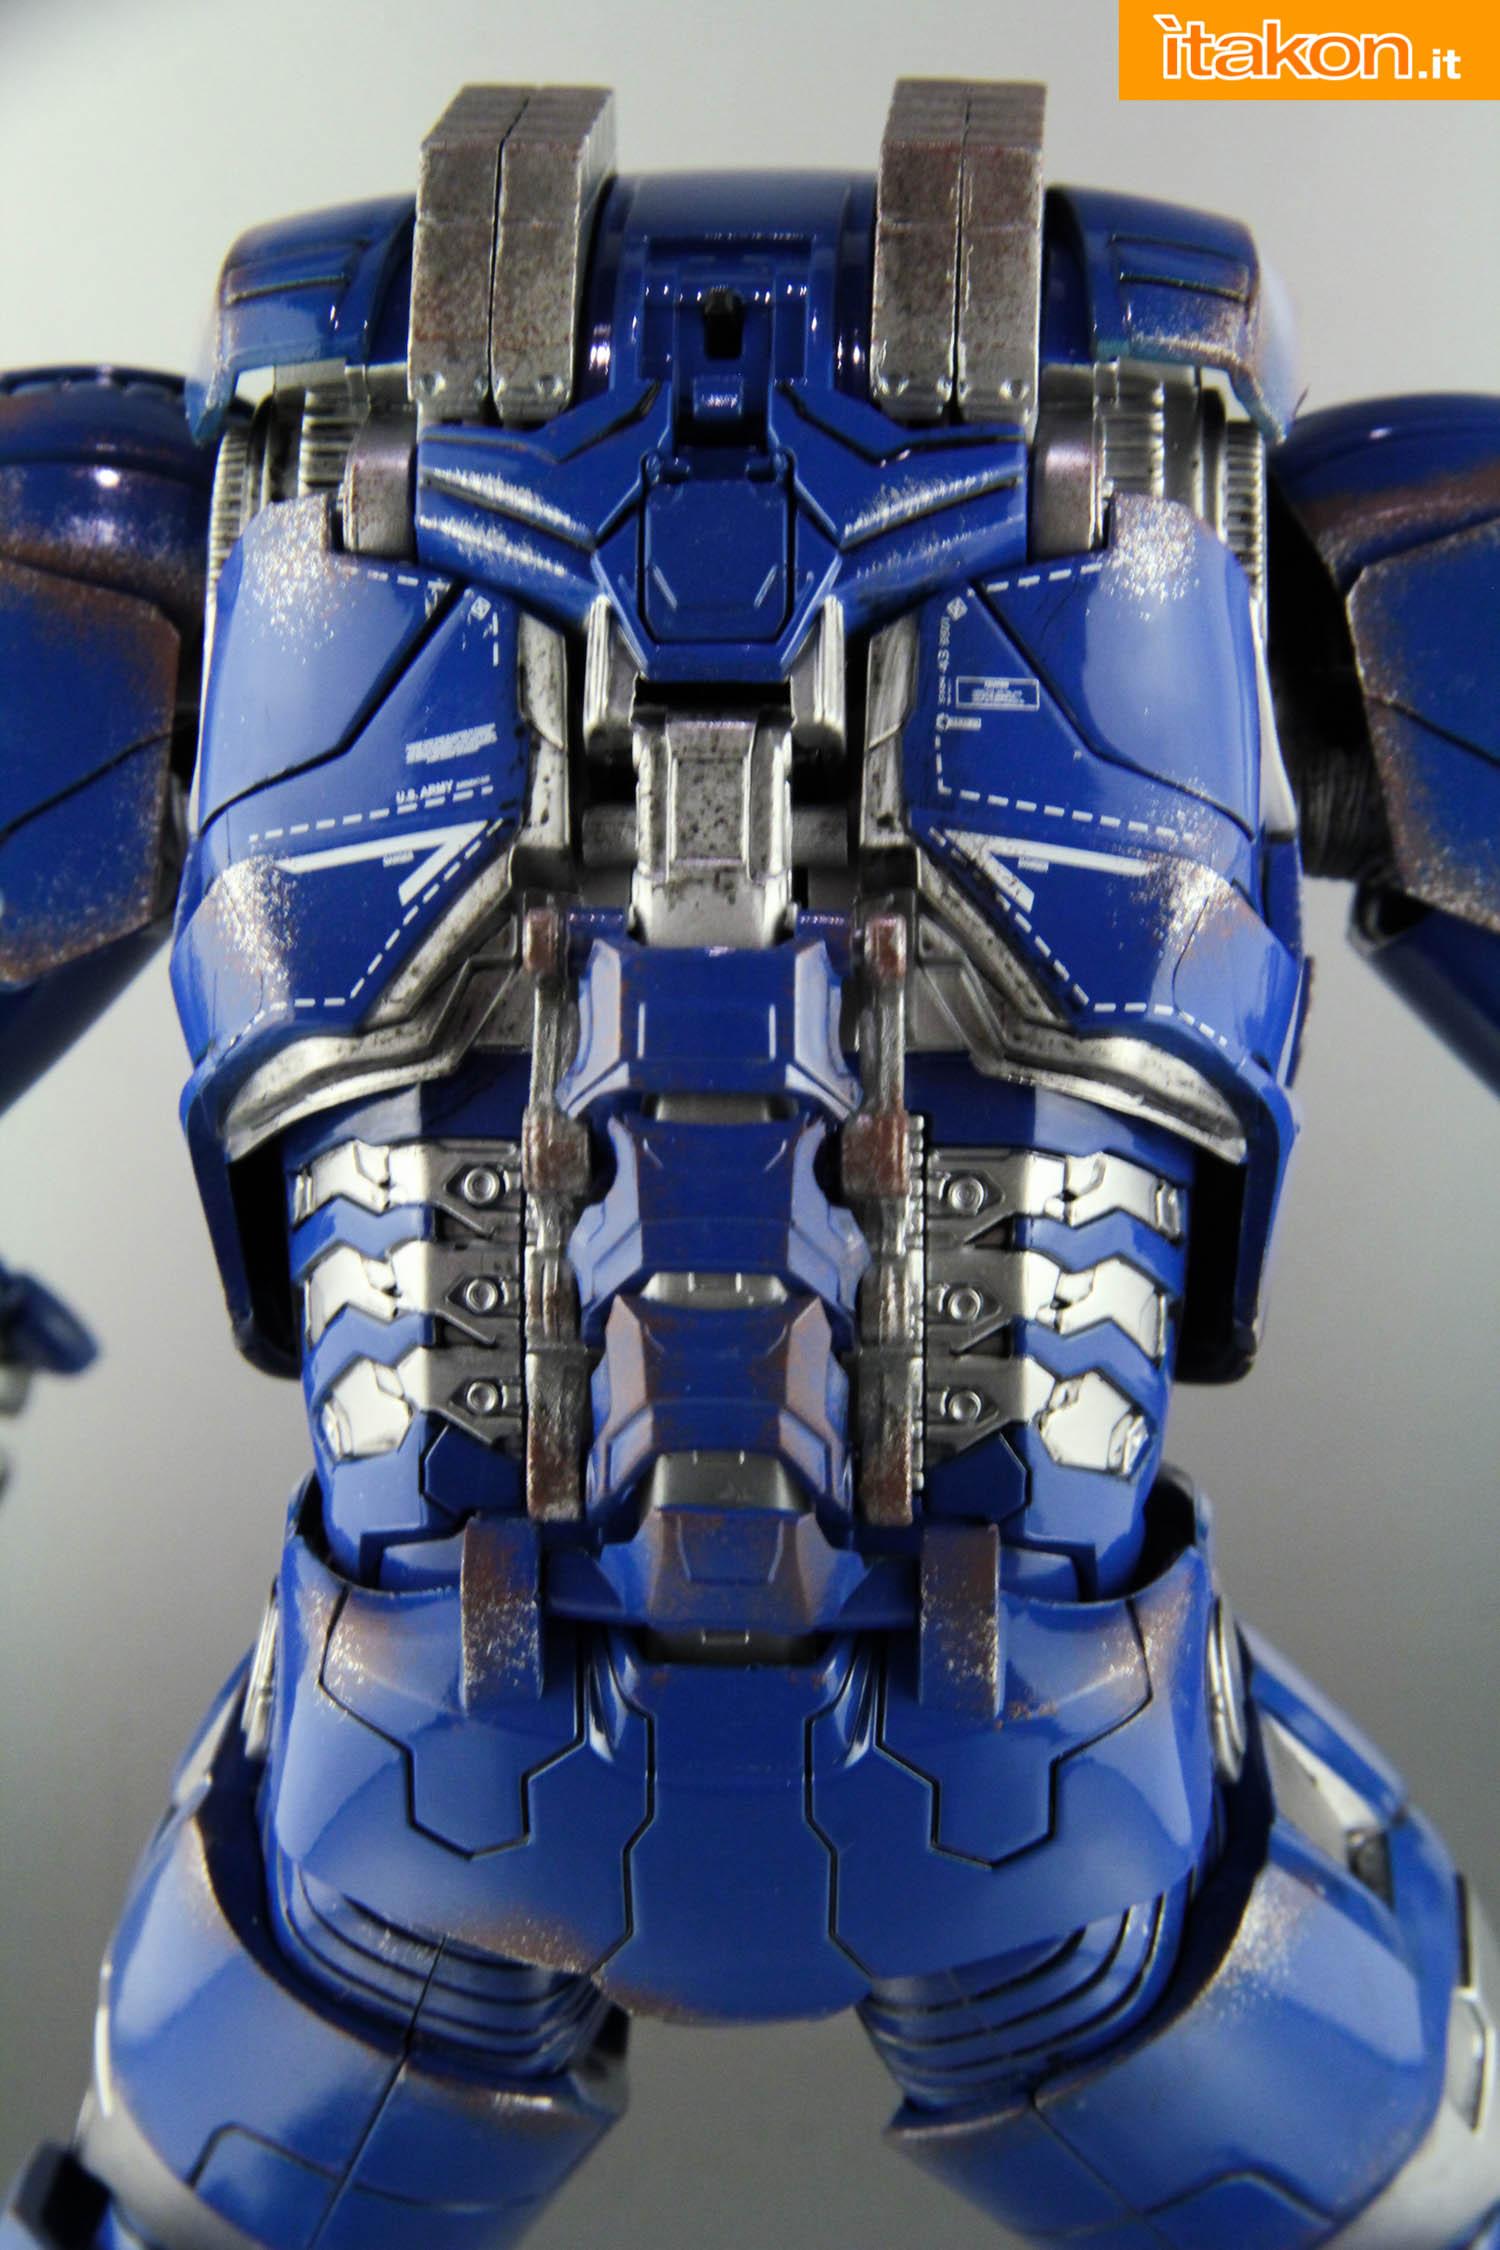 Link a comicave-igor-iron-man-figure-37